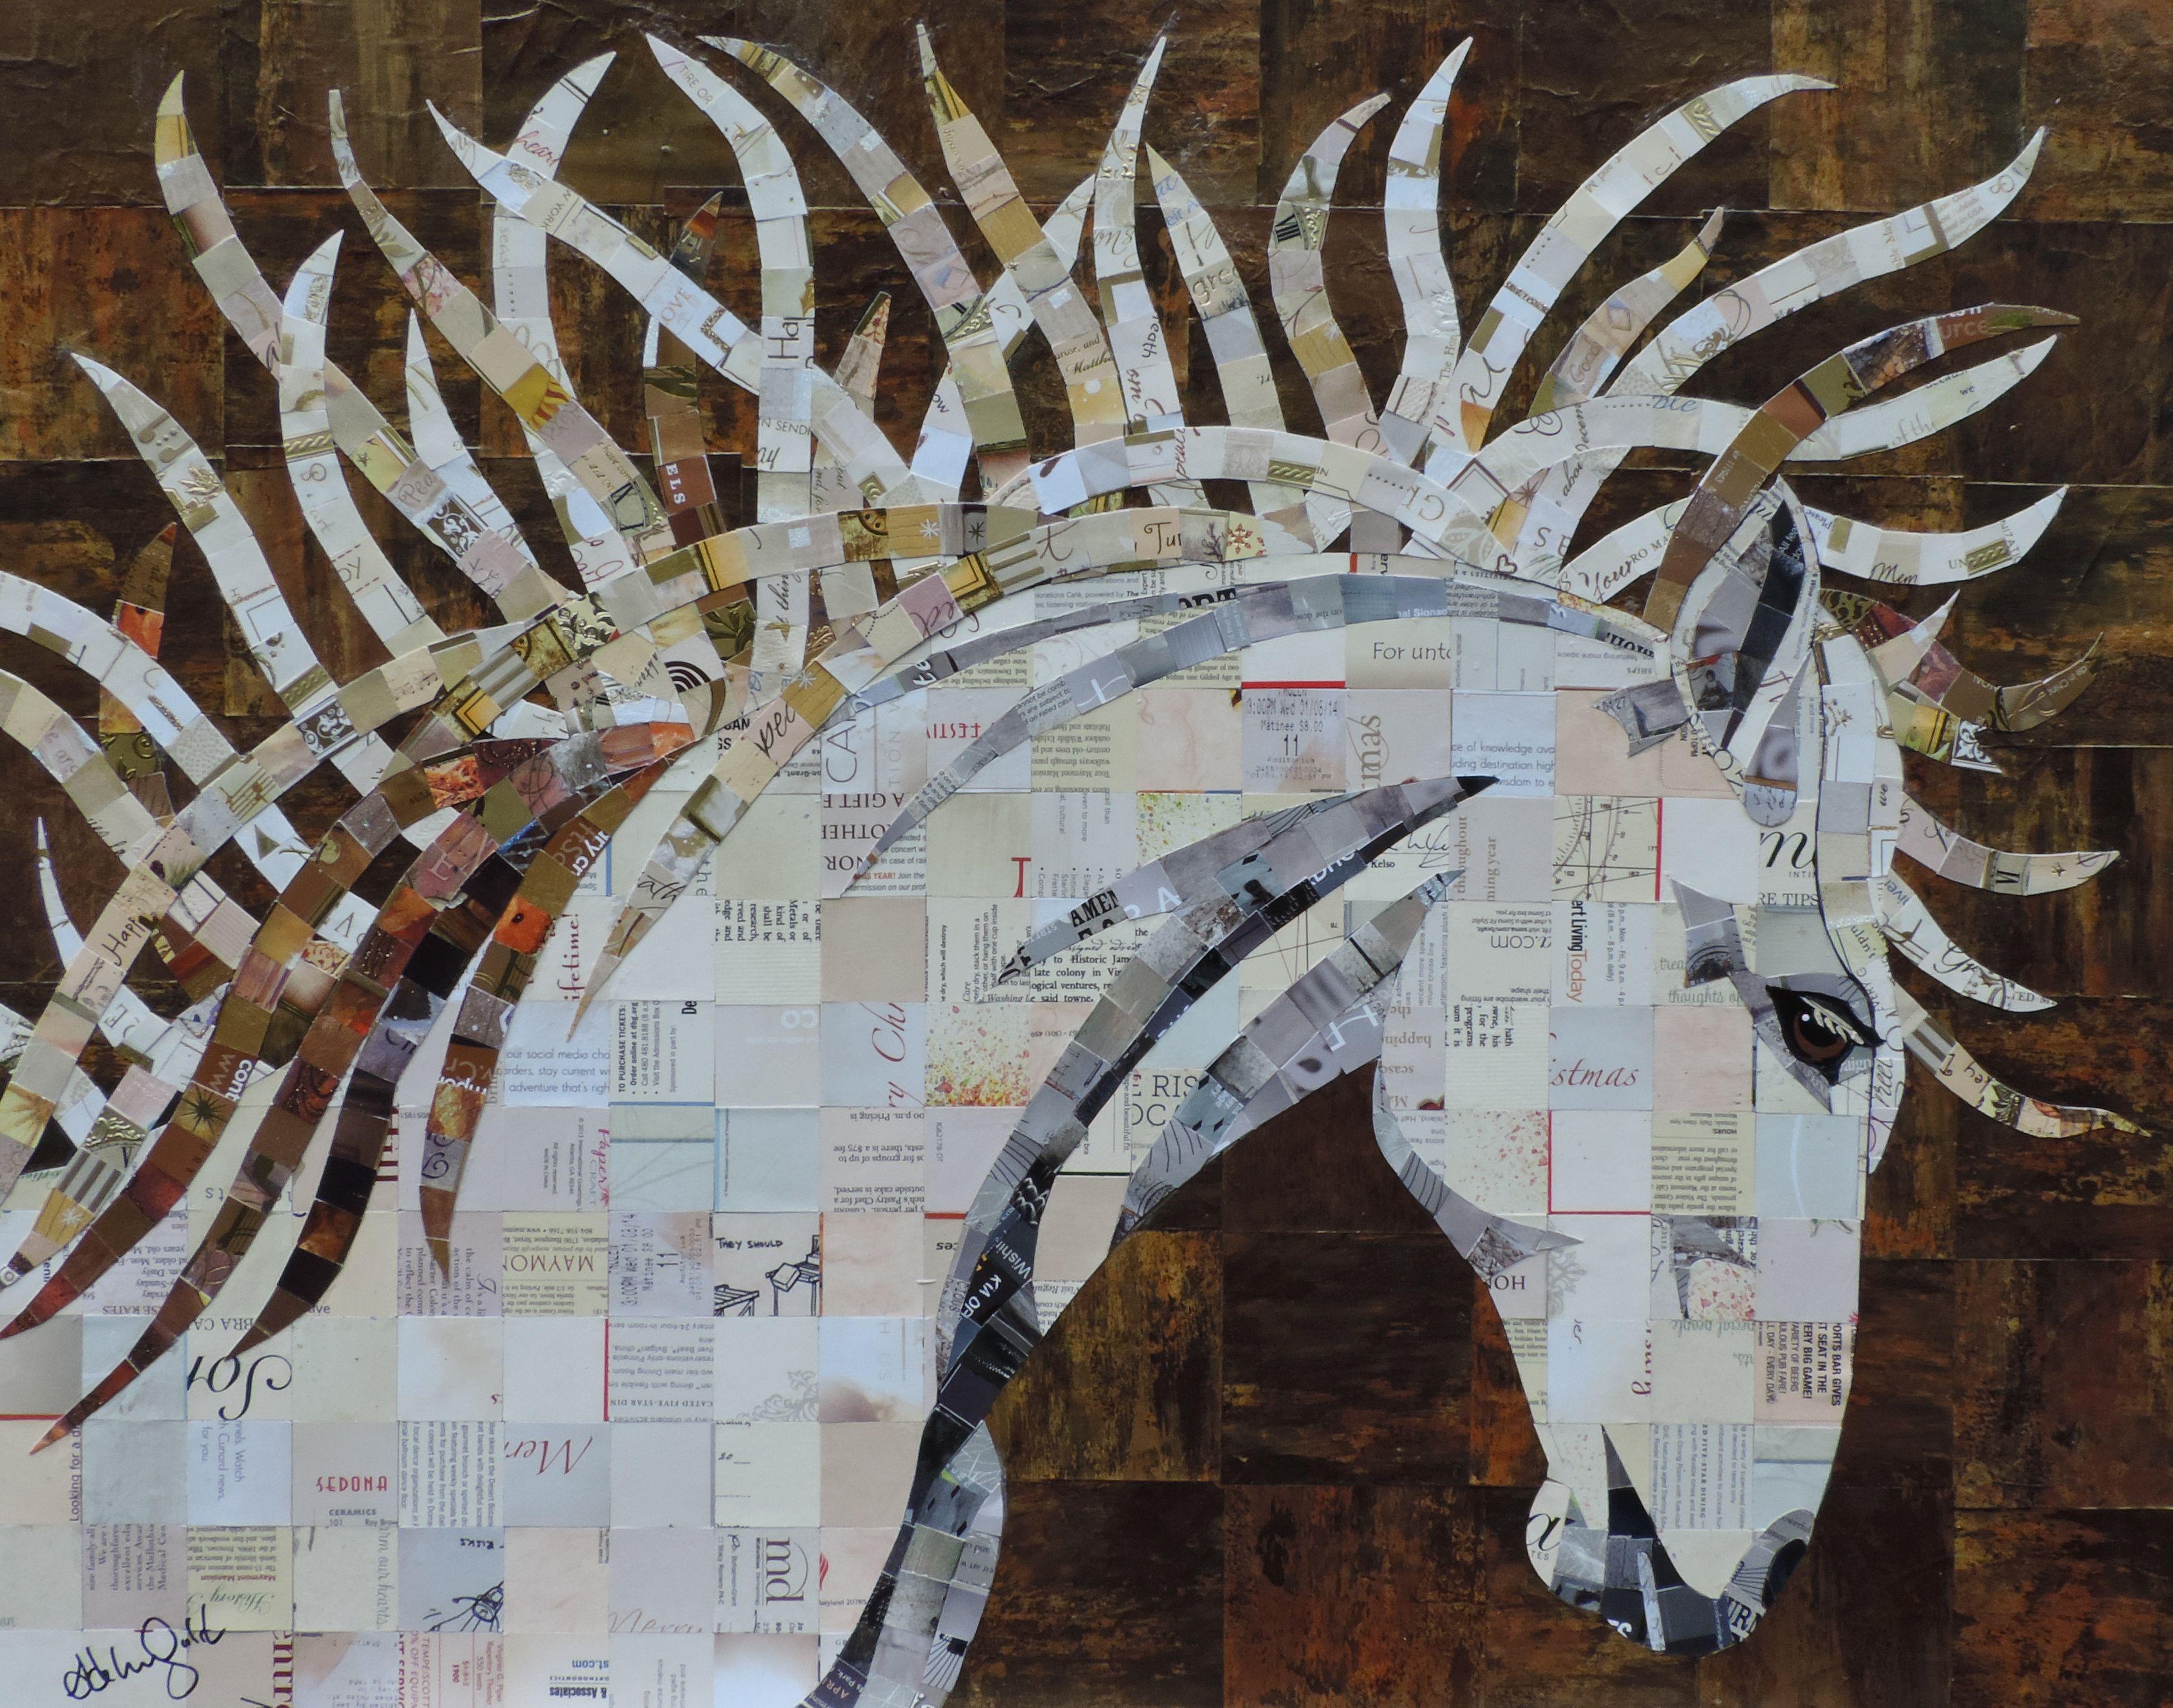 Fantastic Wallpaper Horse Collage - 298bd48d685af4da4d62bacc31a3c9b2  Collection_266869.jpg